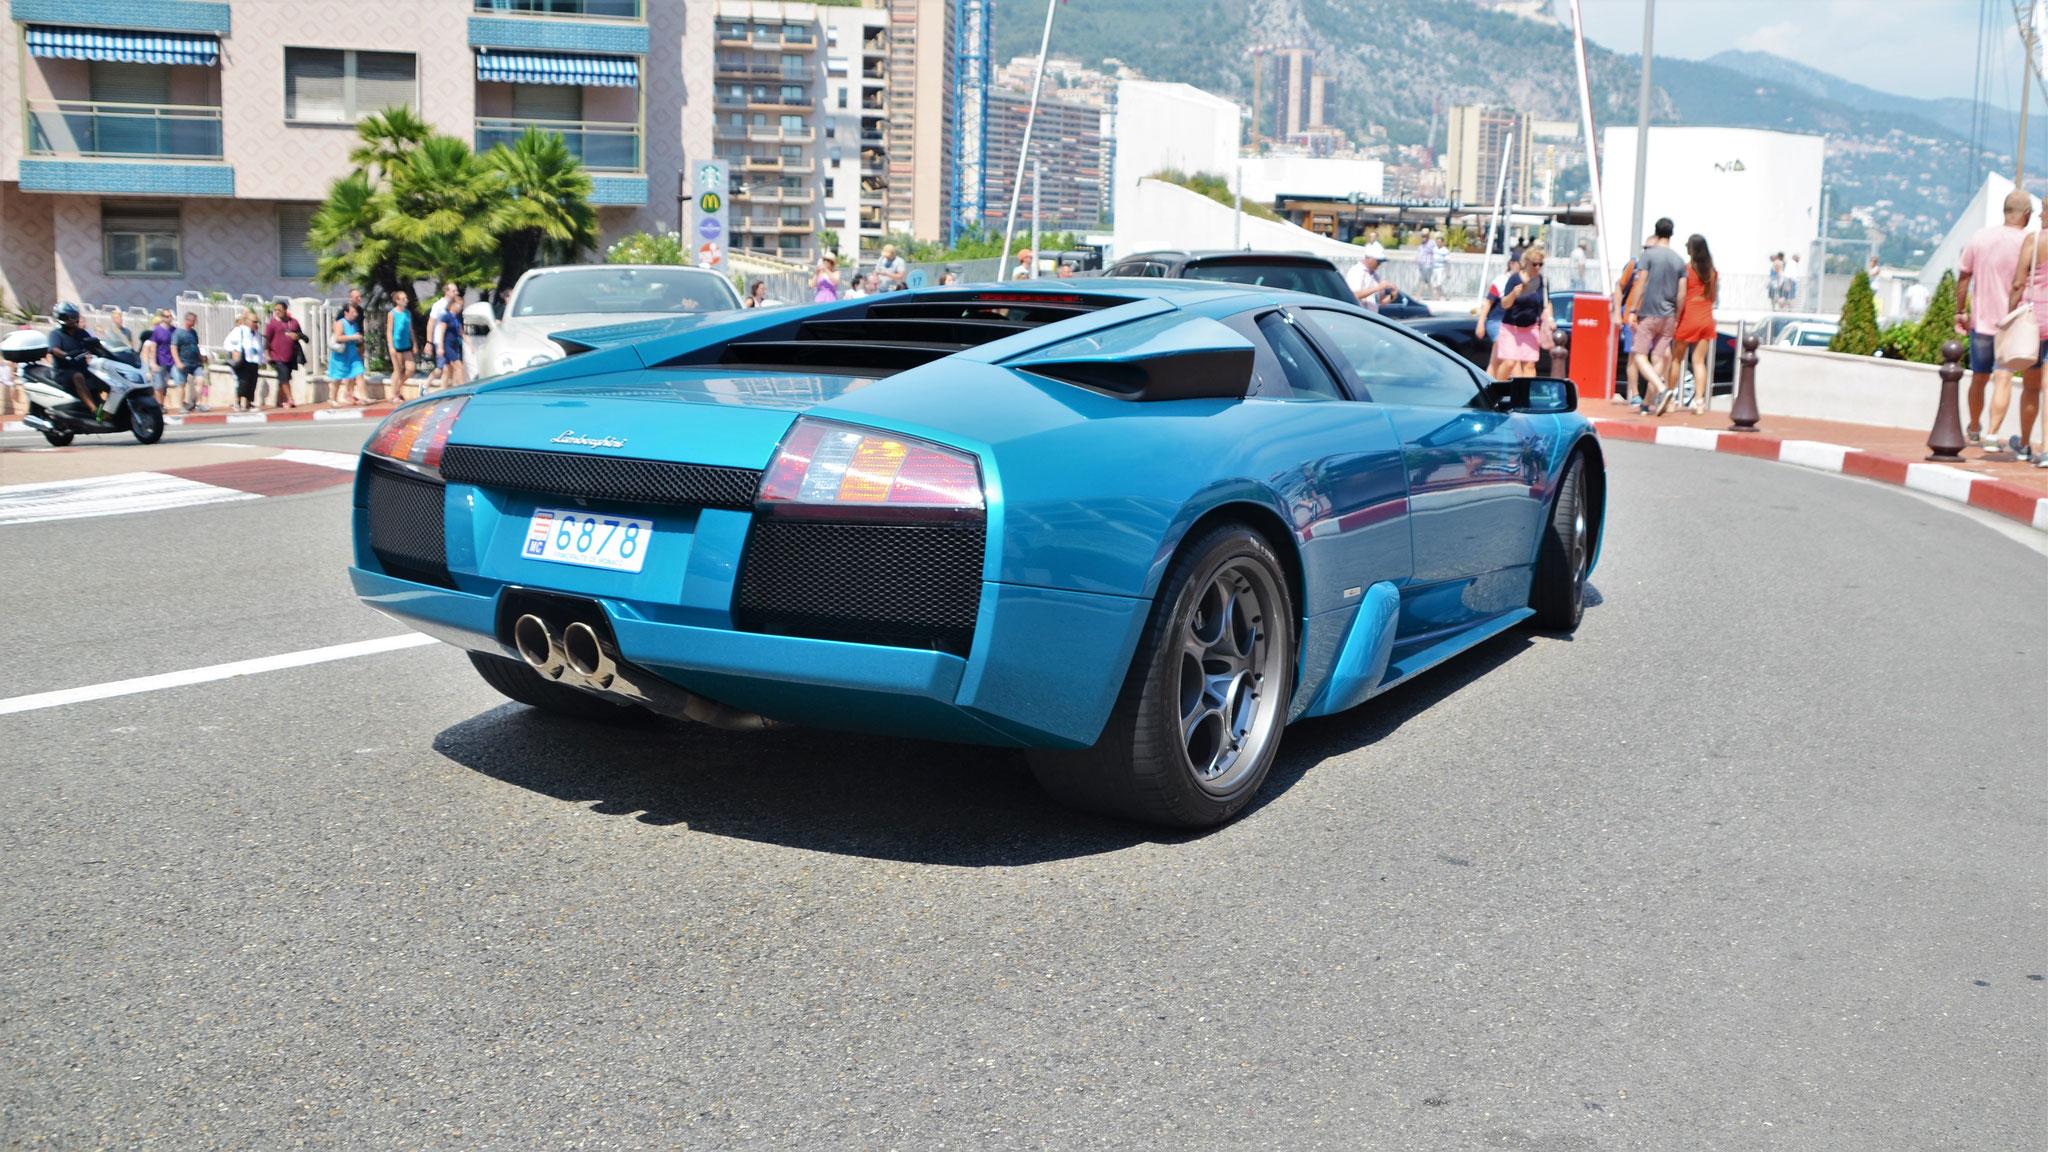 Lamborghini Murcielago - 6878 (MC)